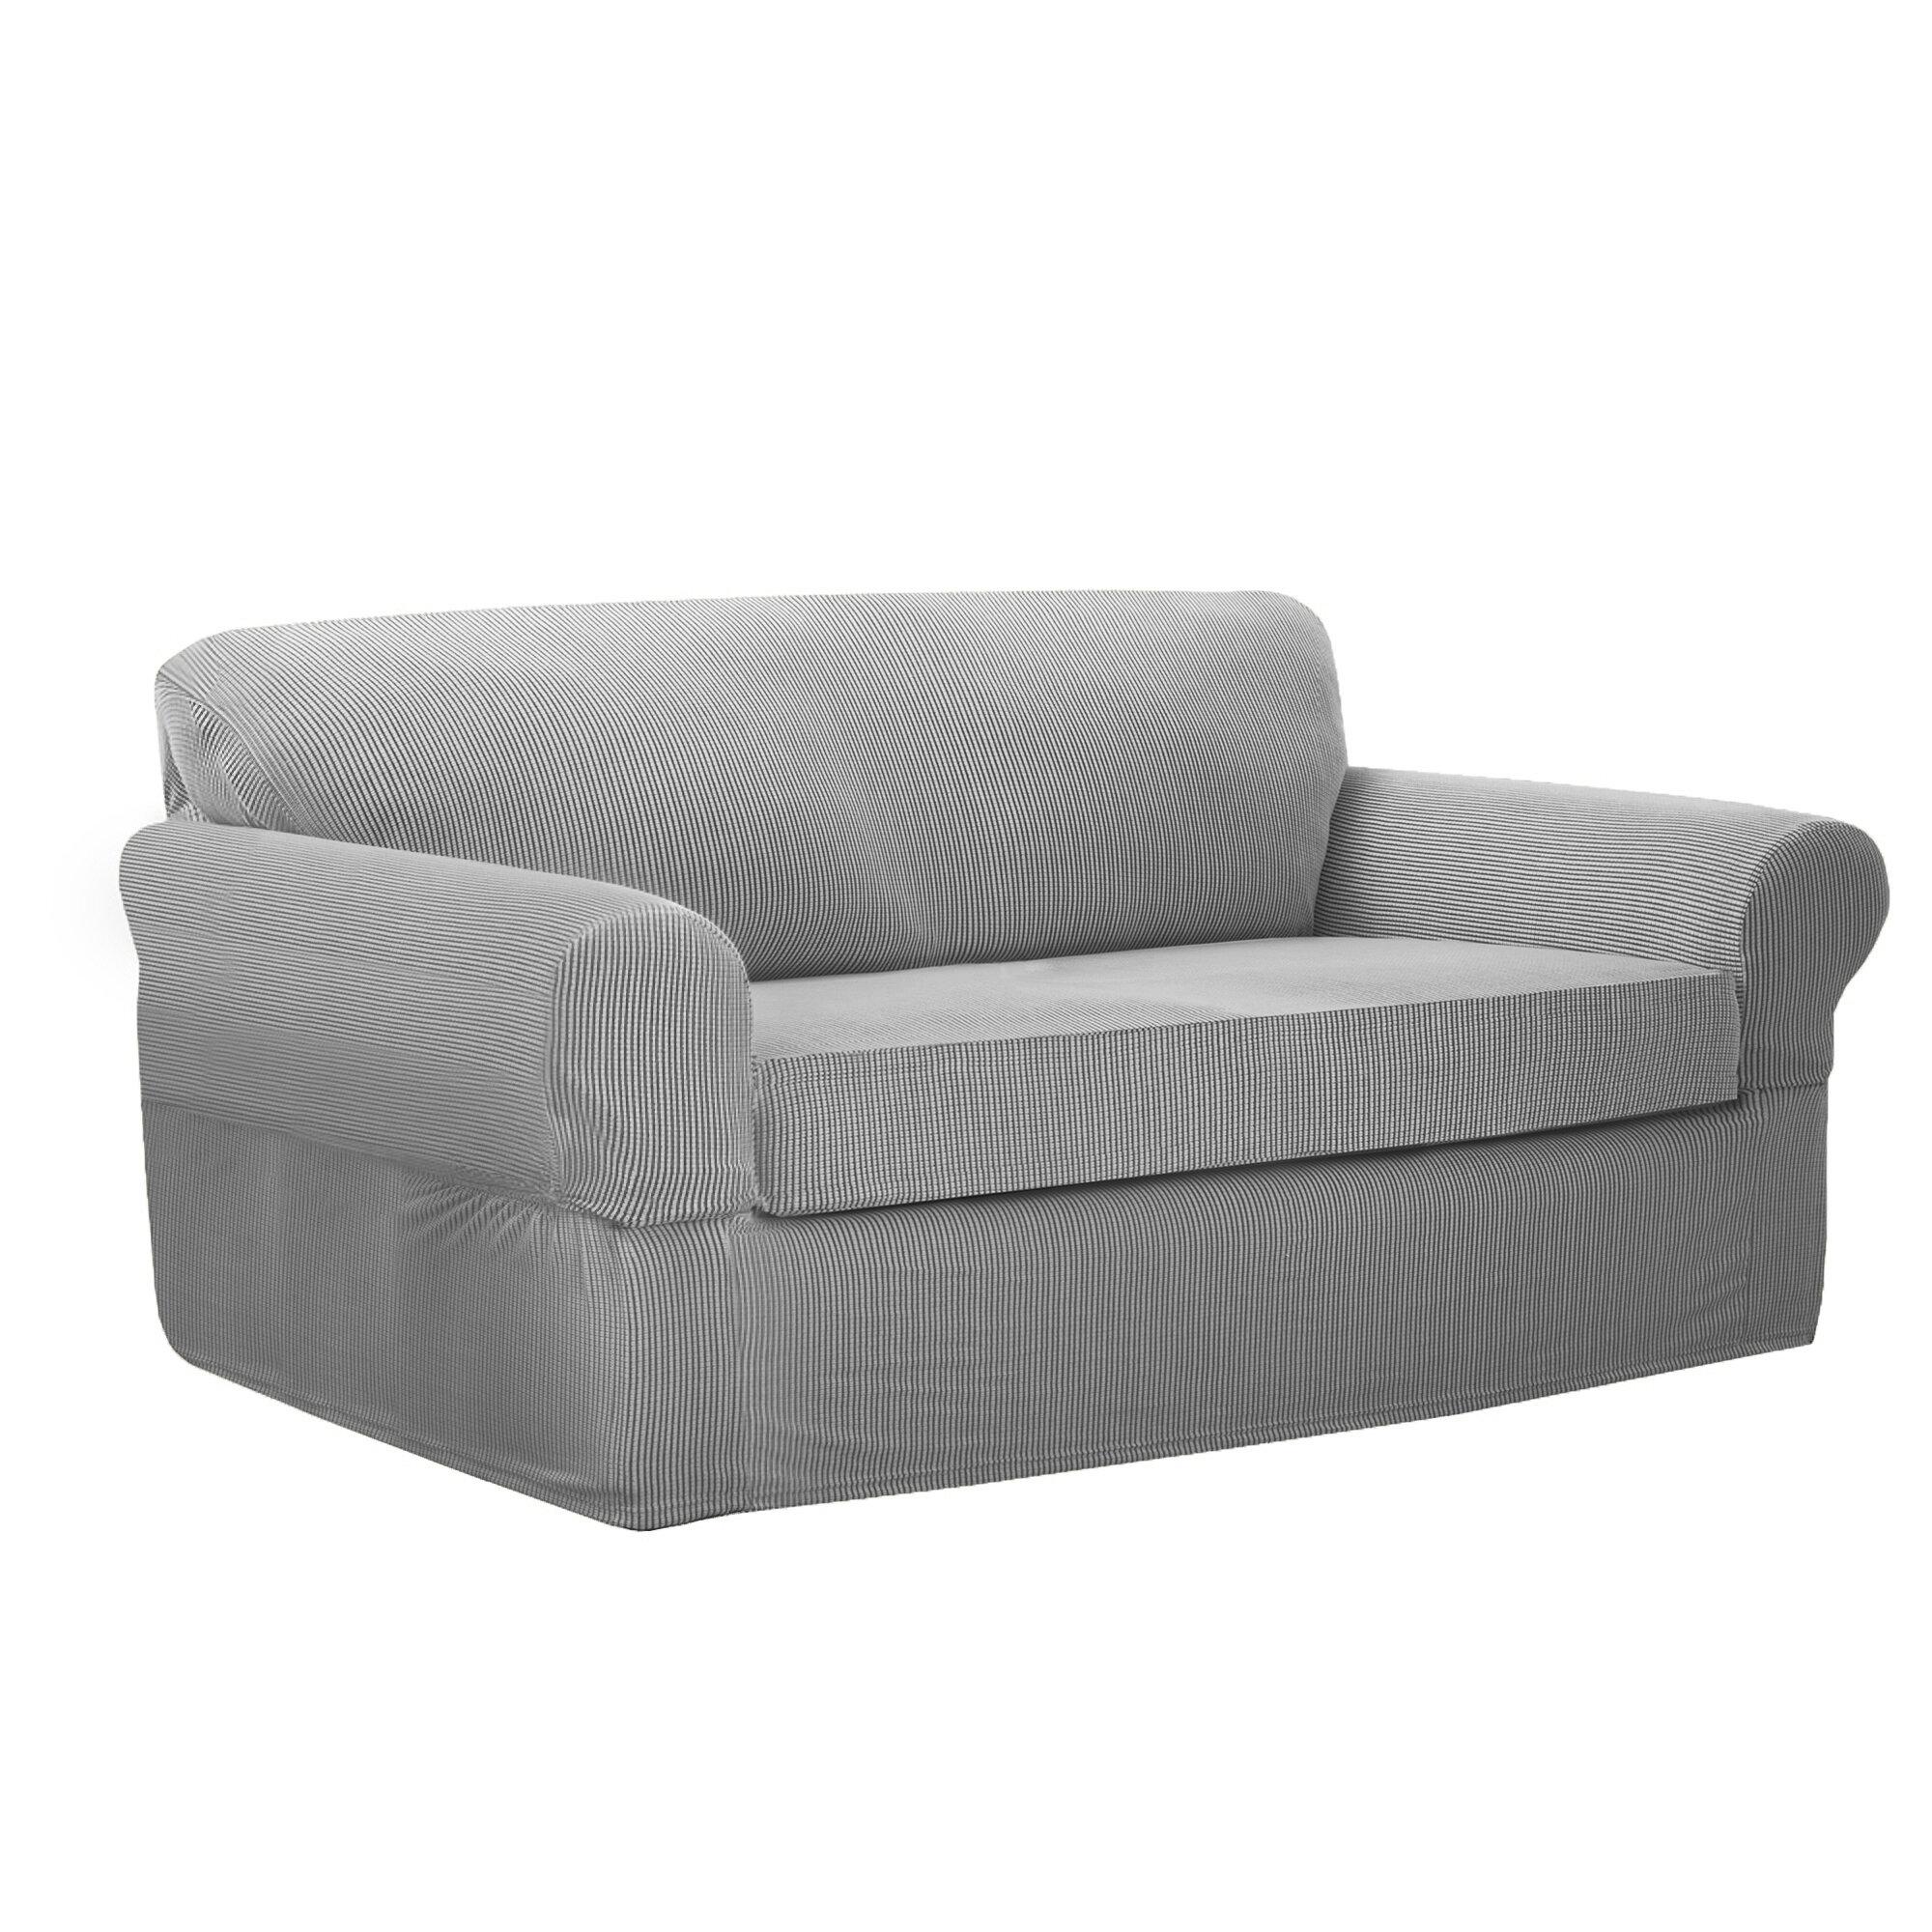 Maytex Connor Box Cushion Sofa Slipcover U0026 Reviews   Wayfair